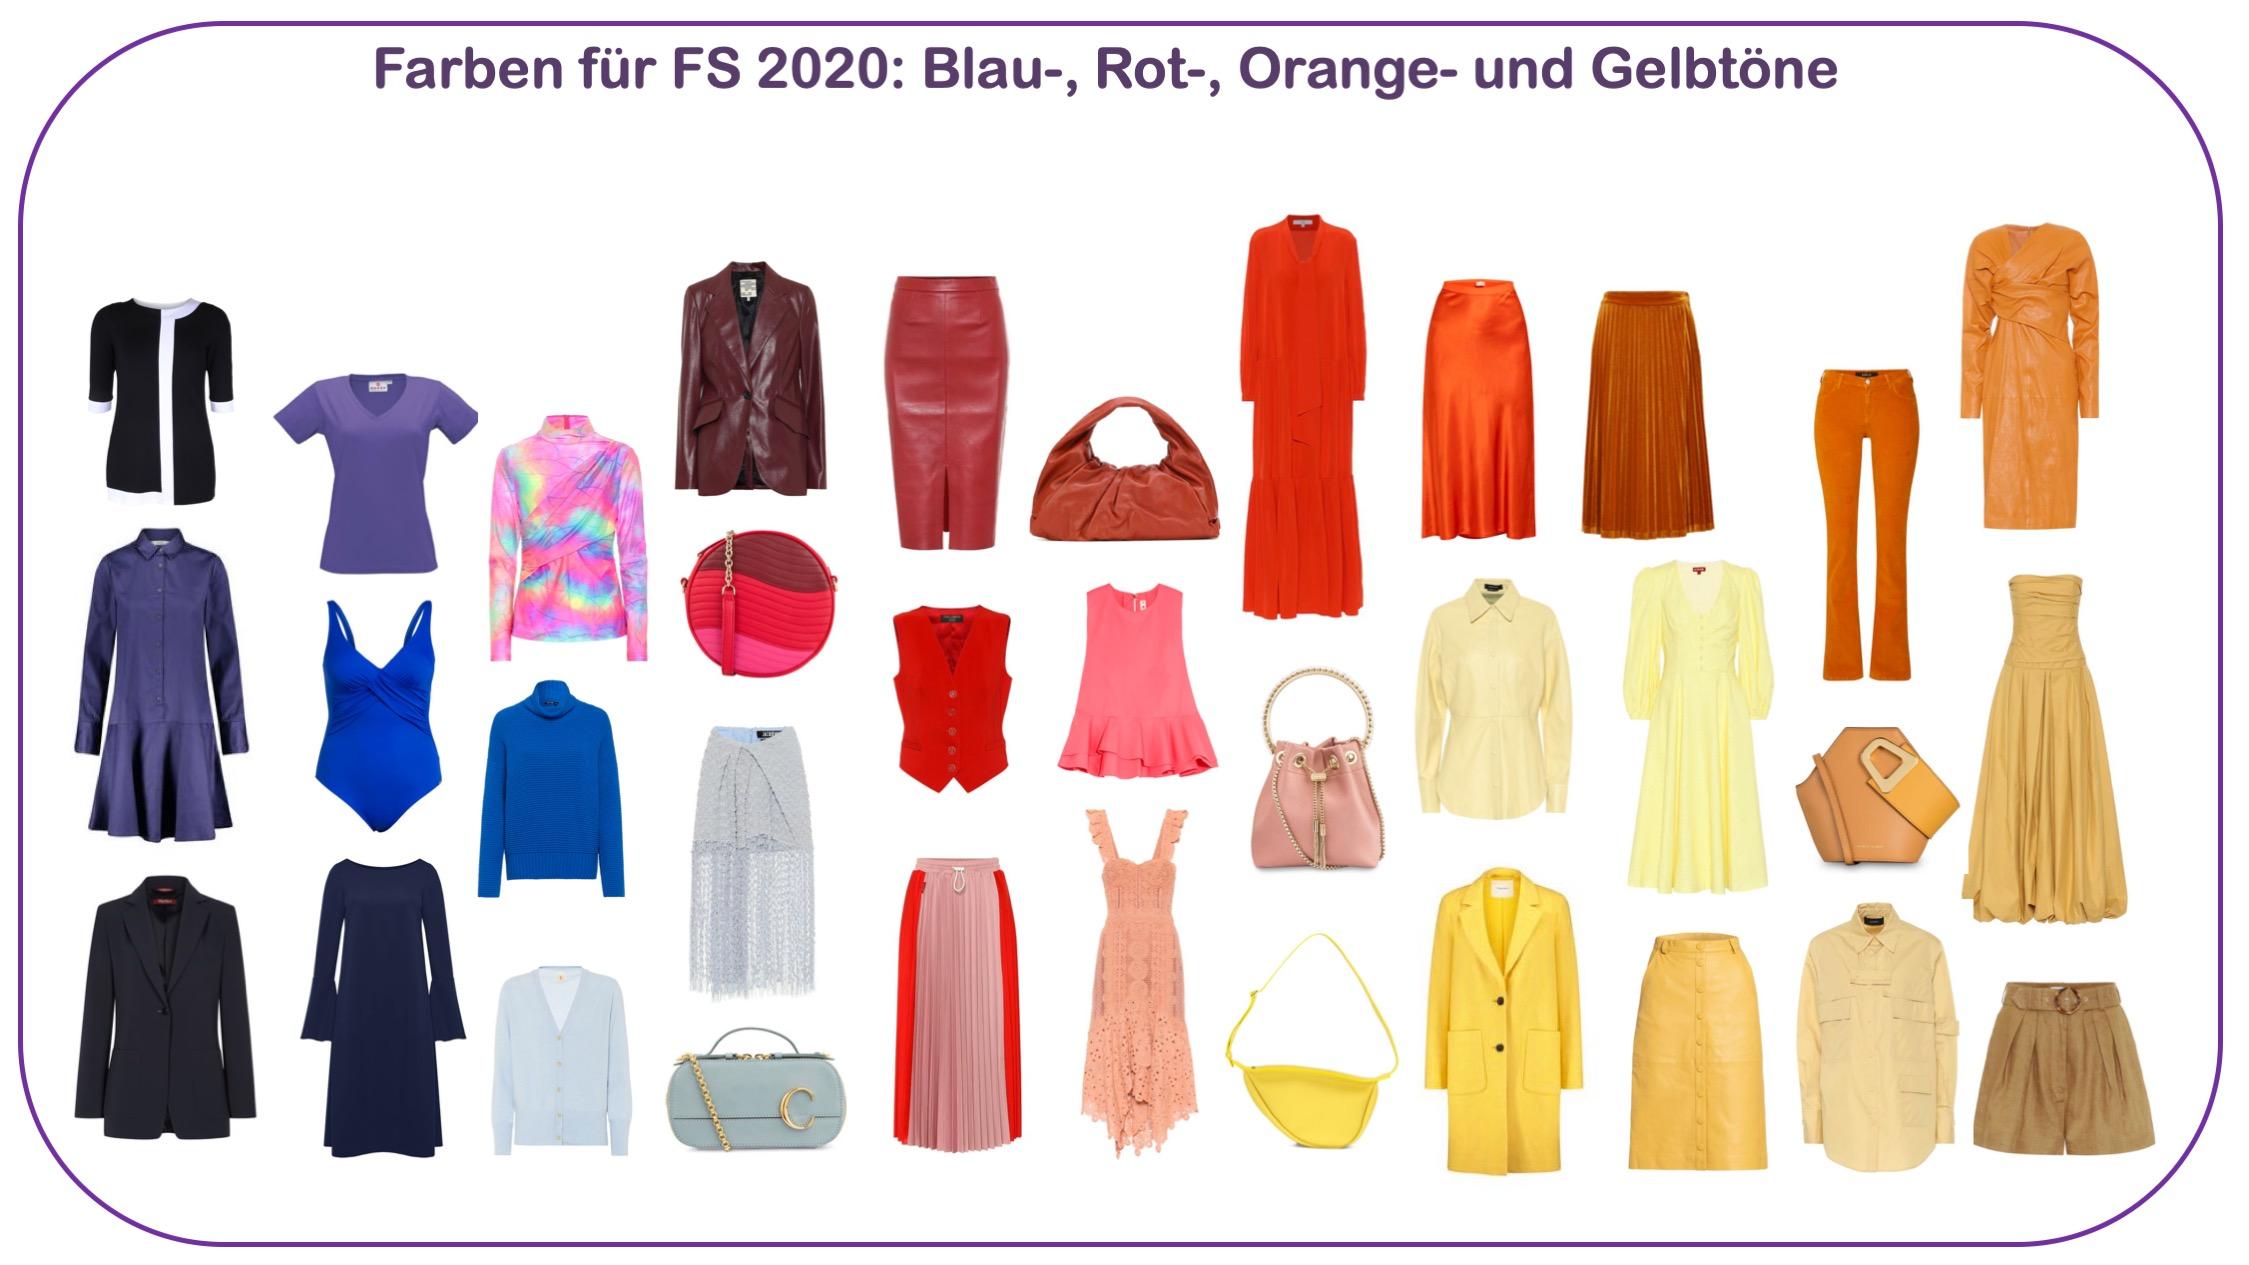 Modetrends FS 2020 - Farben